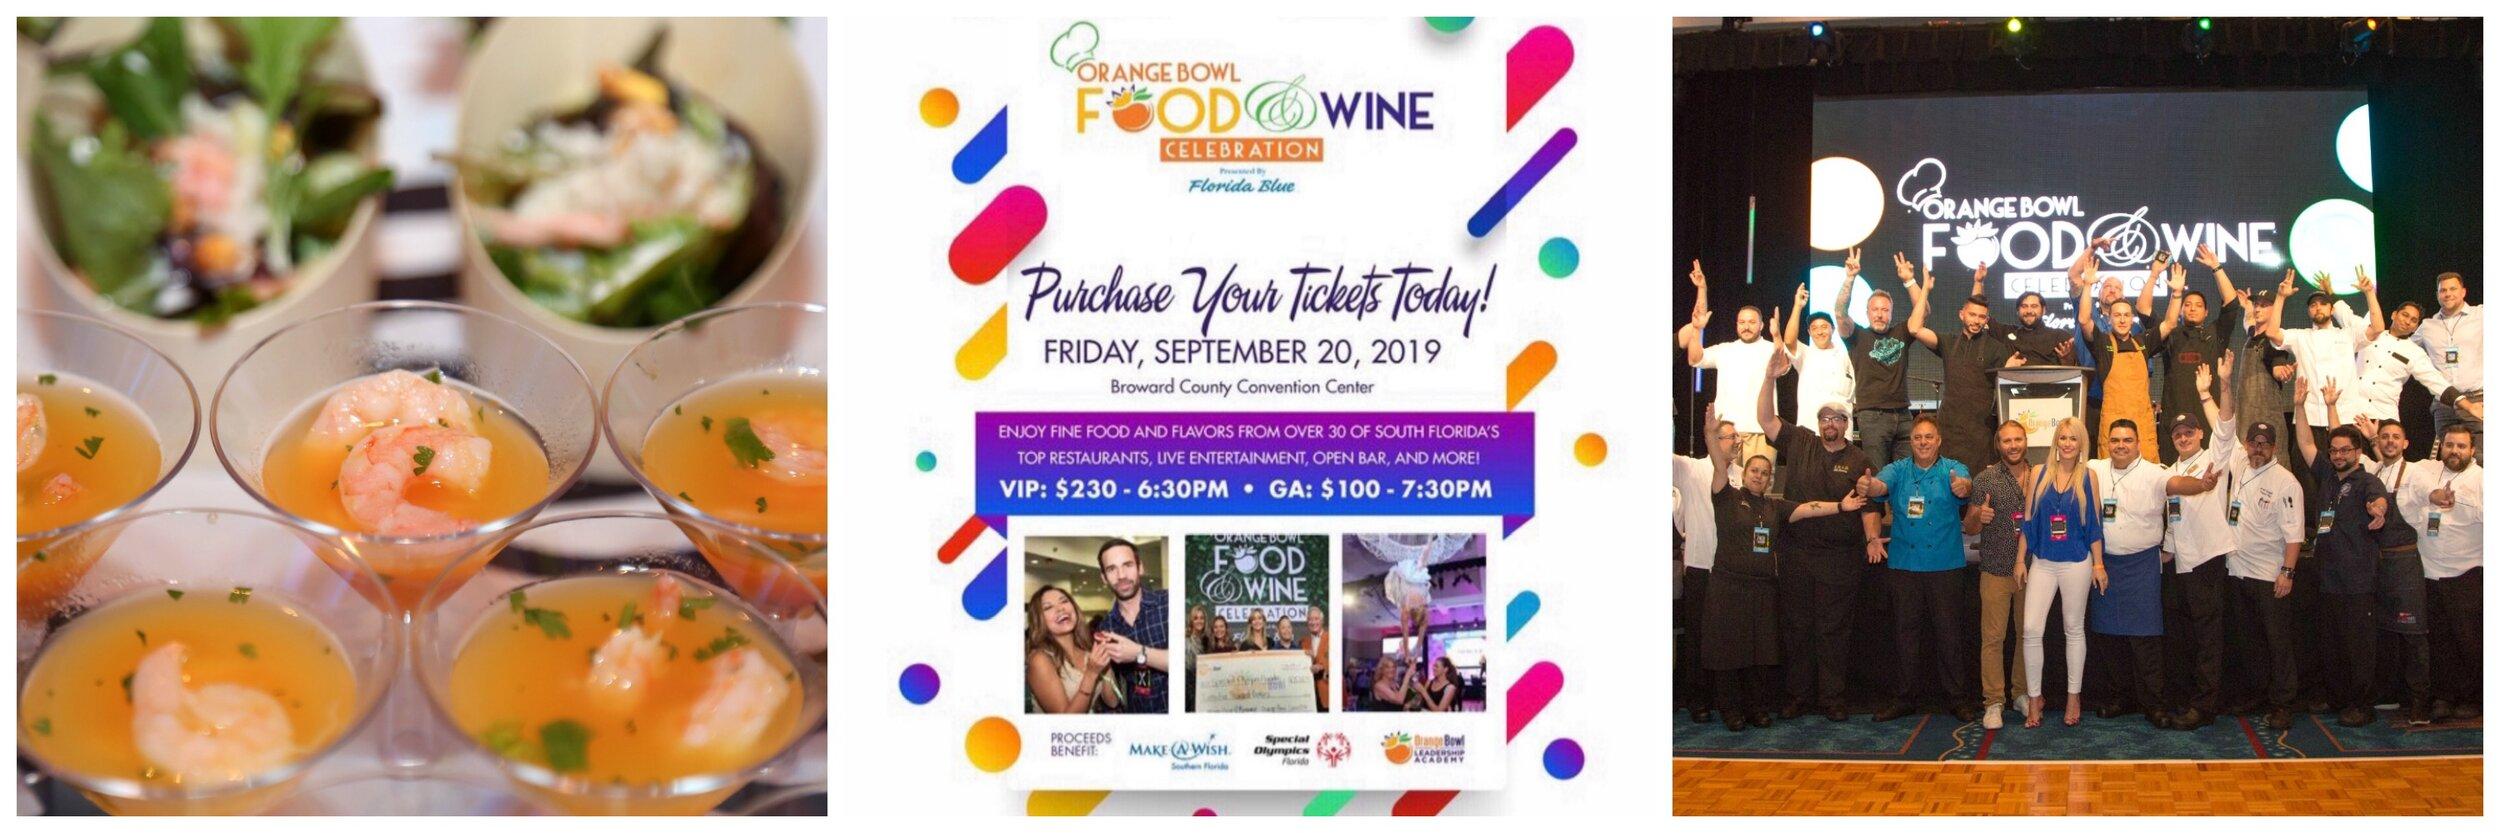 Orange Bowl Food and Wine Festival 2019